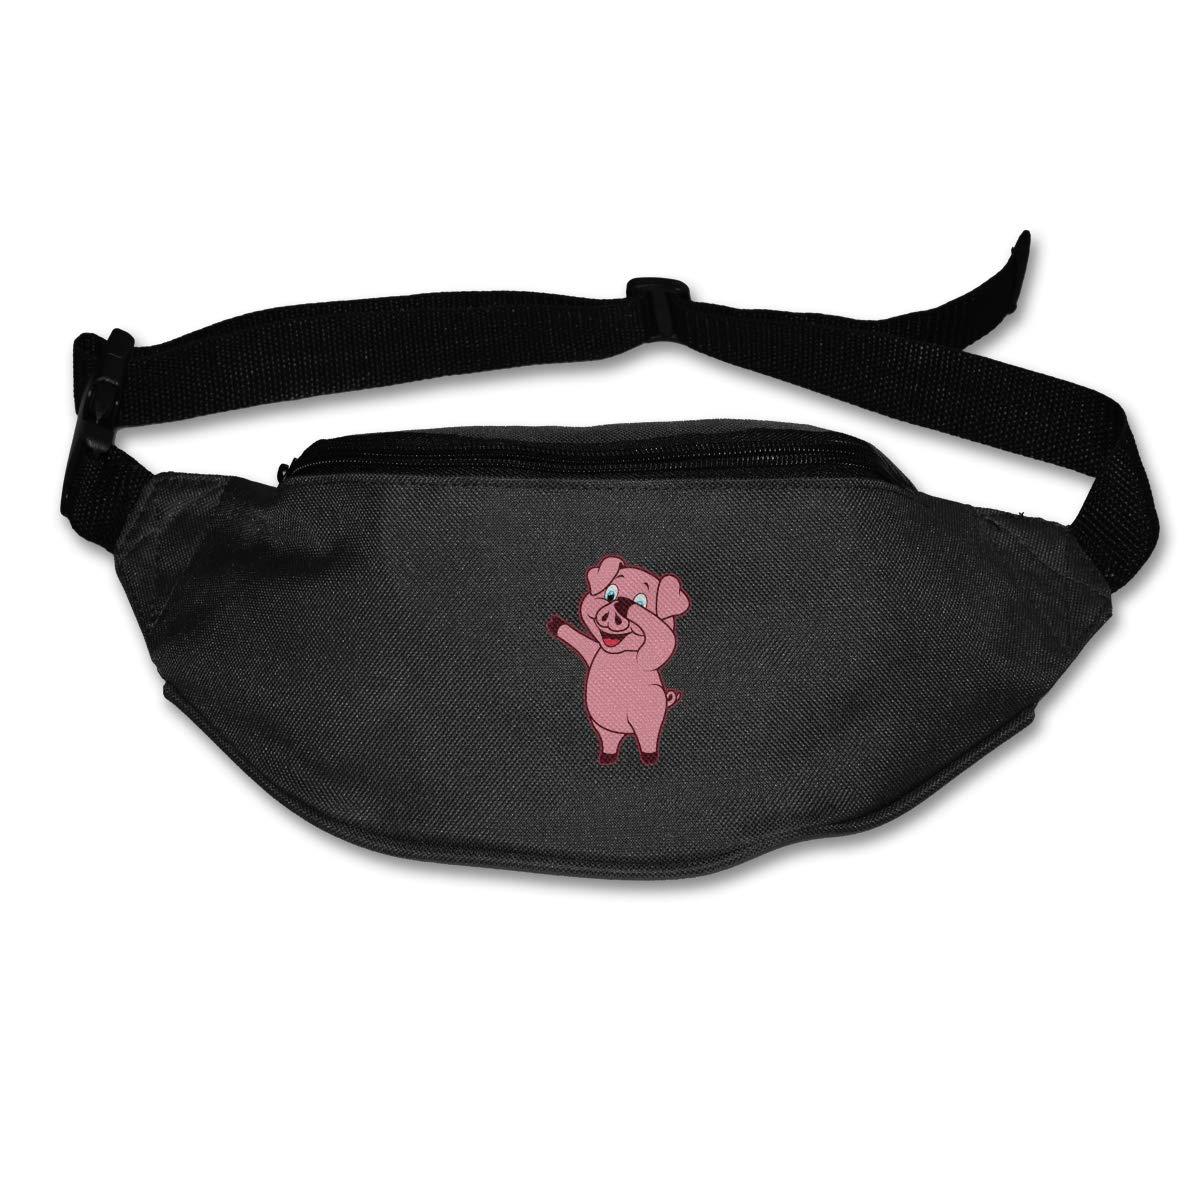 Kawaii Pig Dabbing Sport Waist Pack Fanny Pack Adjustable For Run